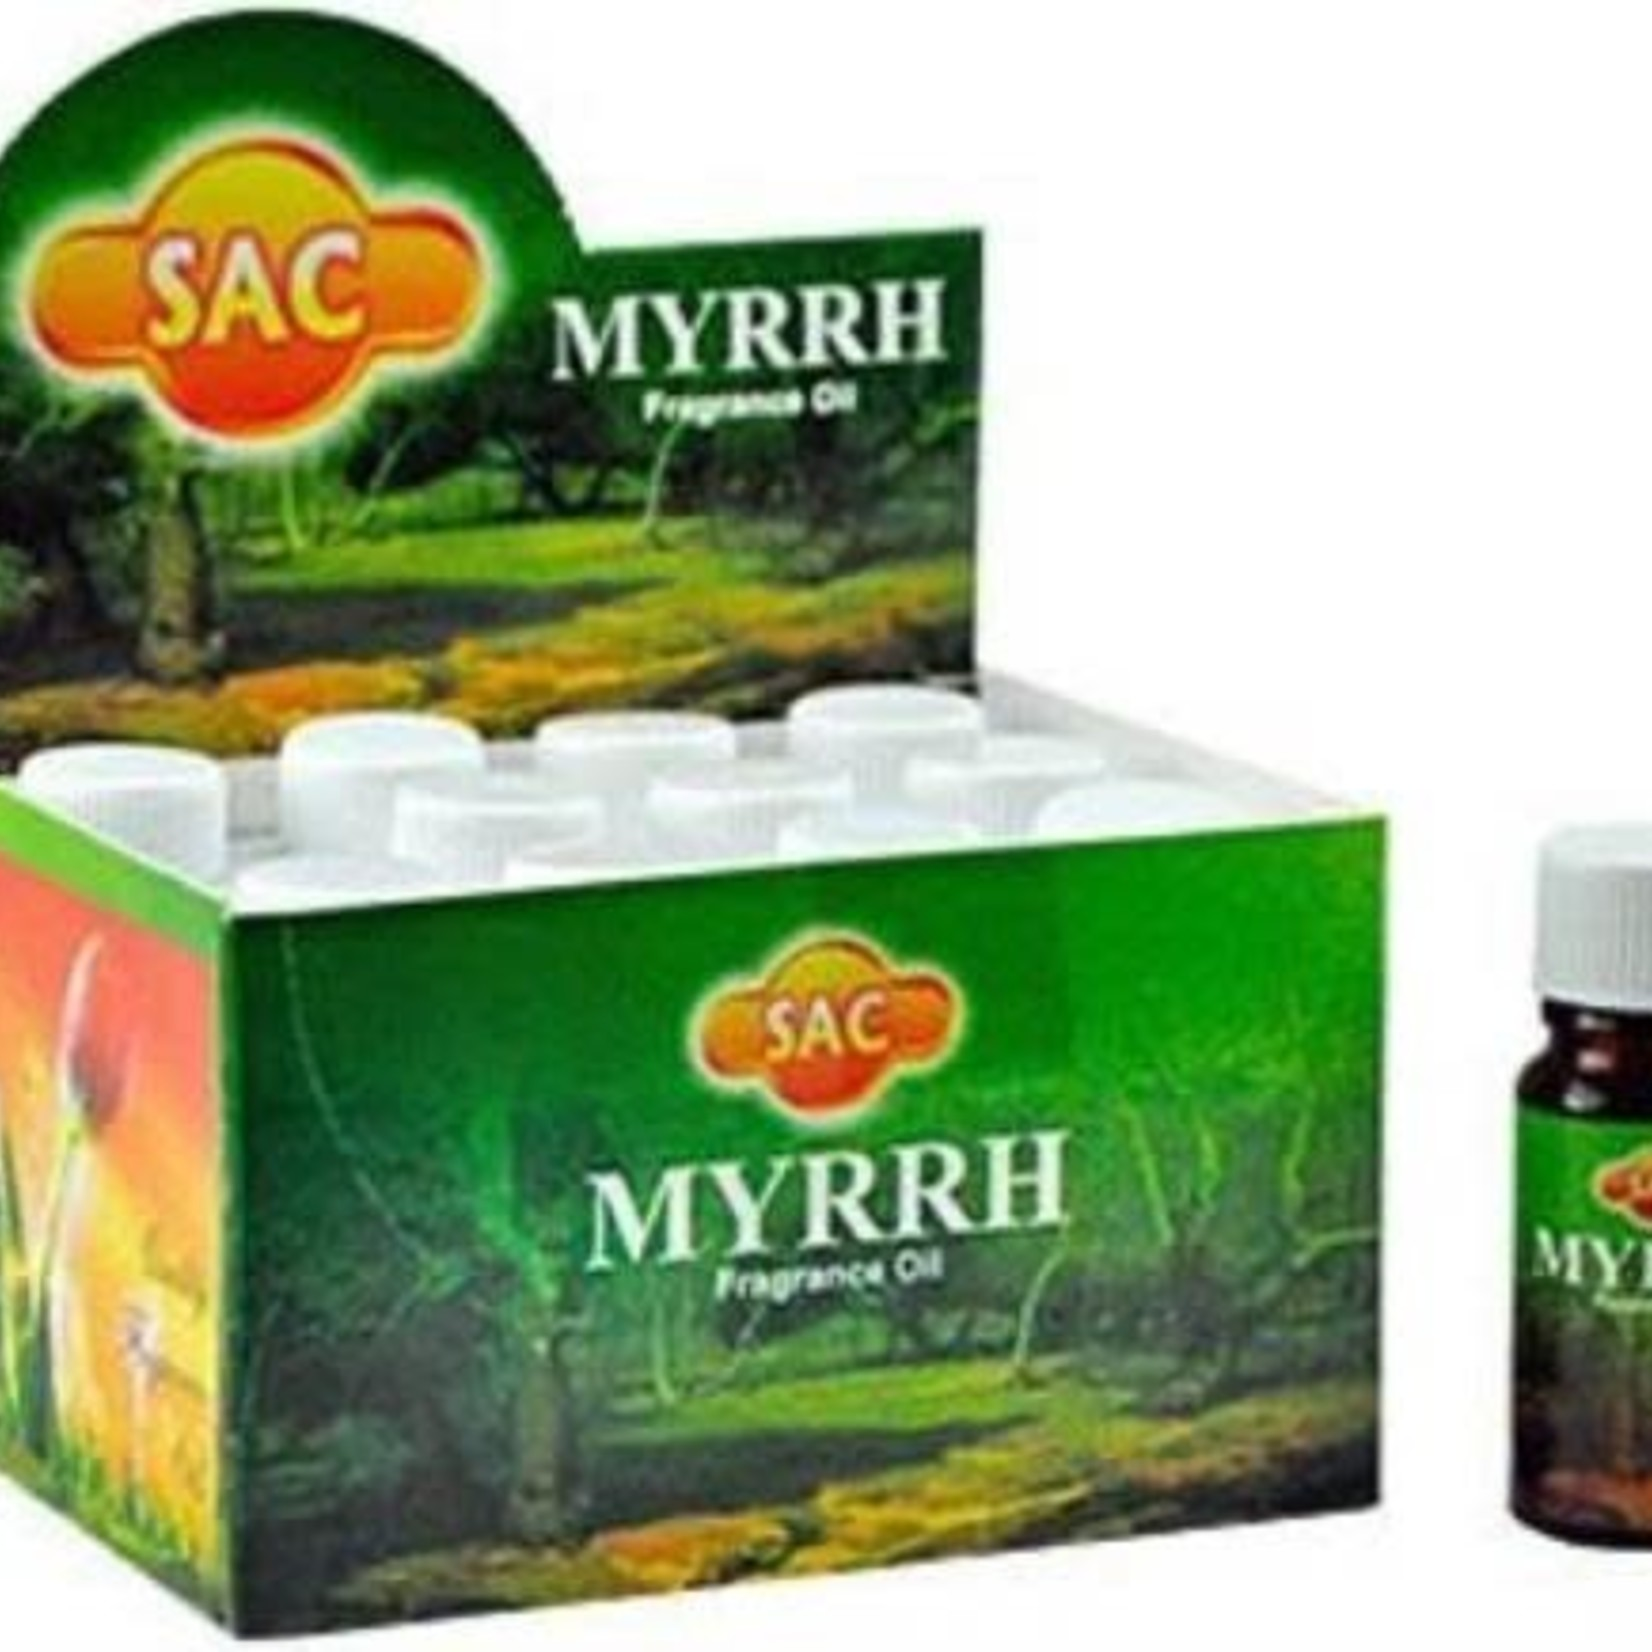 Myrrh Fragrance oil - SAC